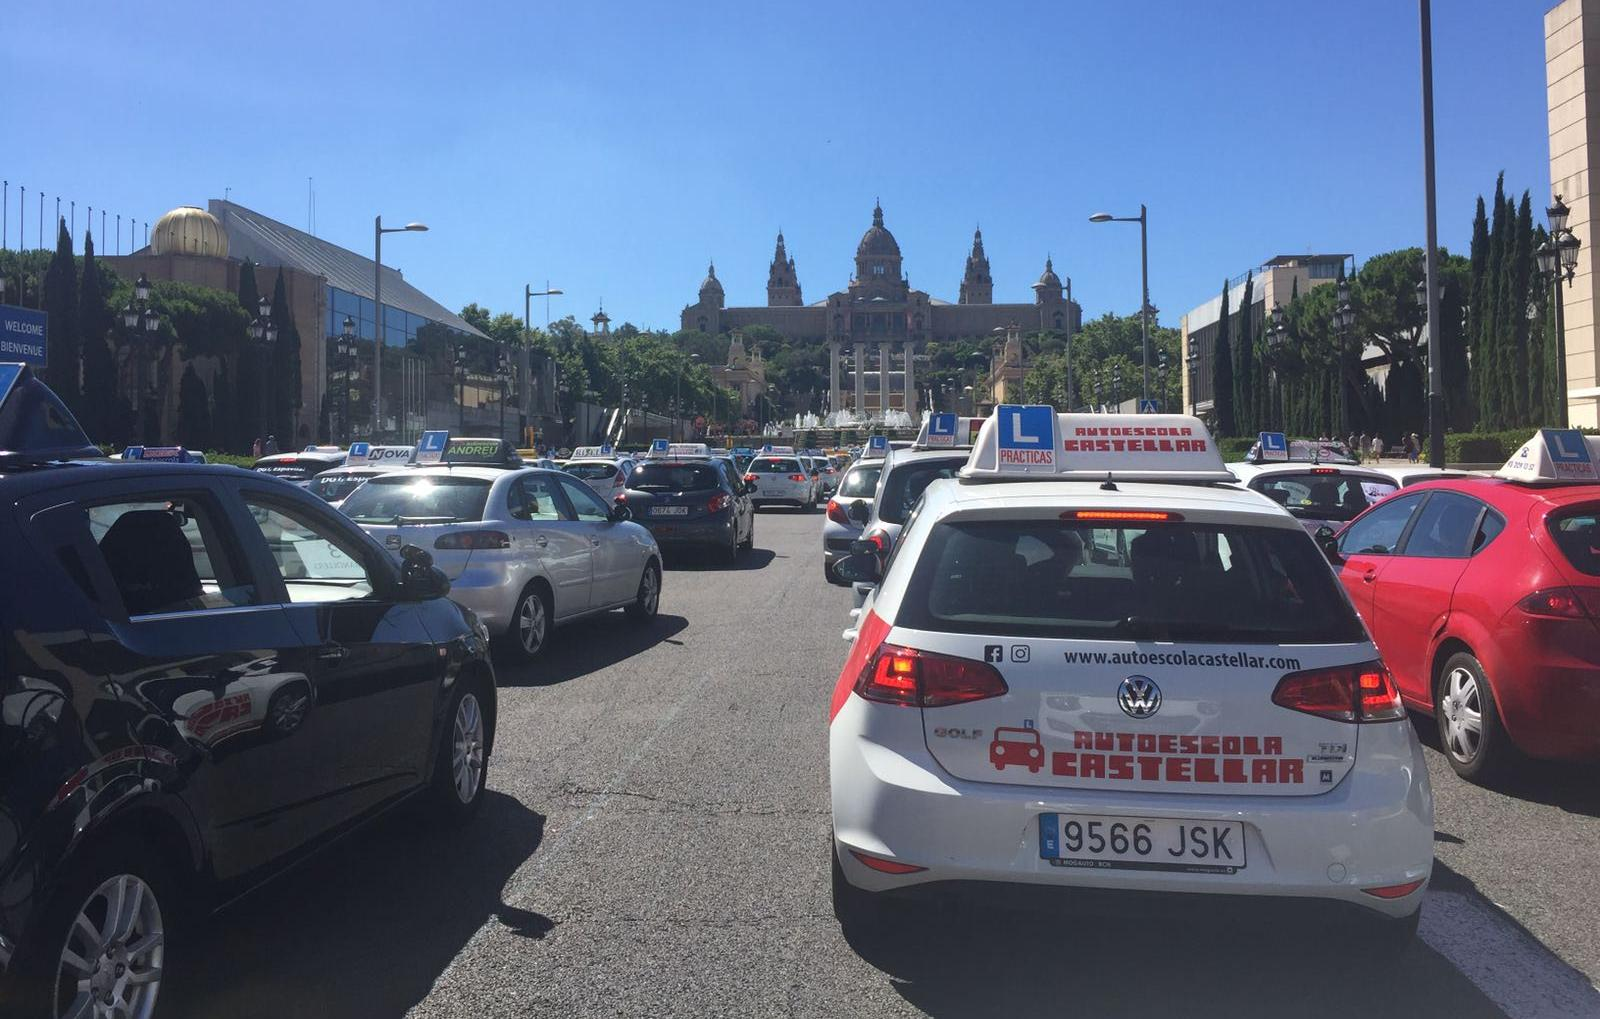 Les autoescoles castellarenques protesten a barcelona for Oficina trafico sabadell